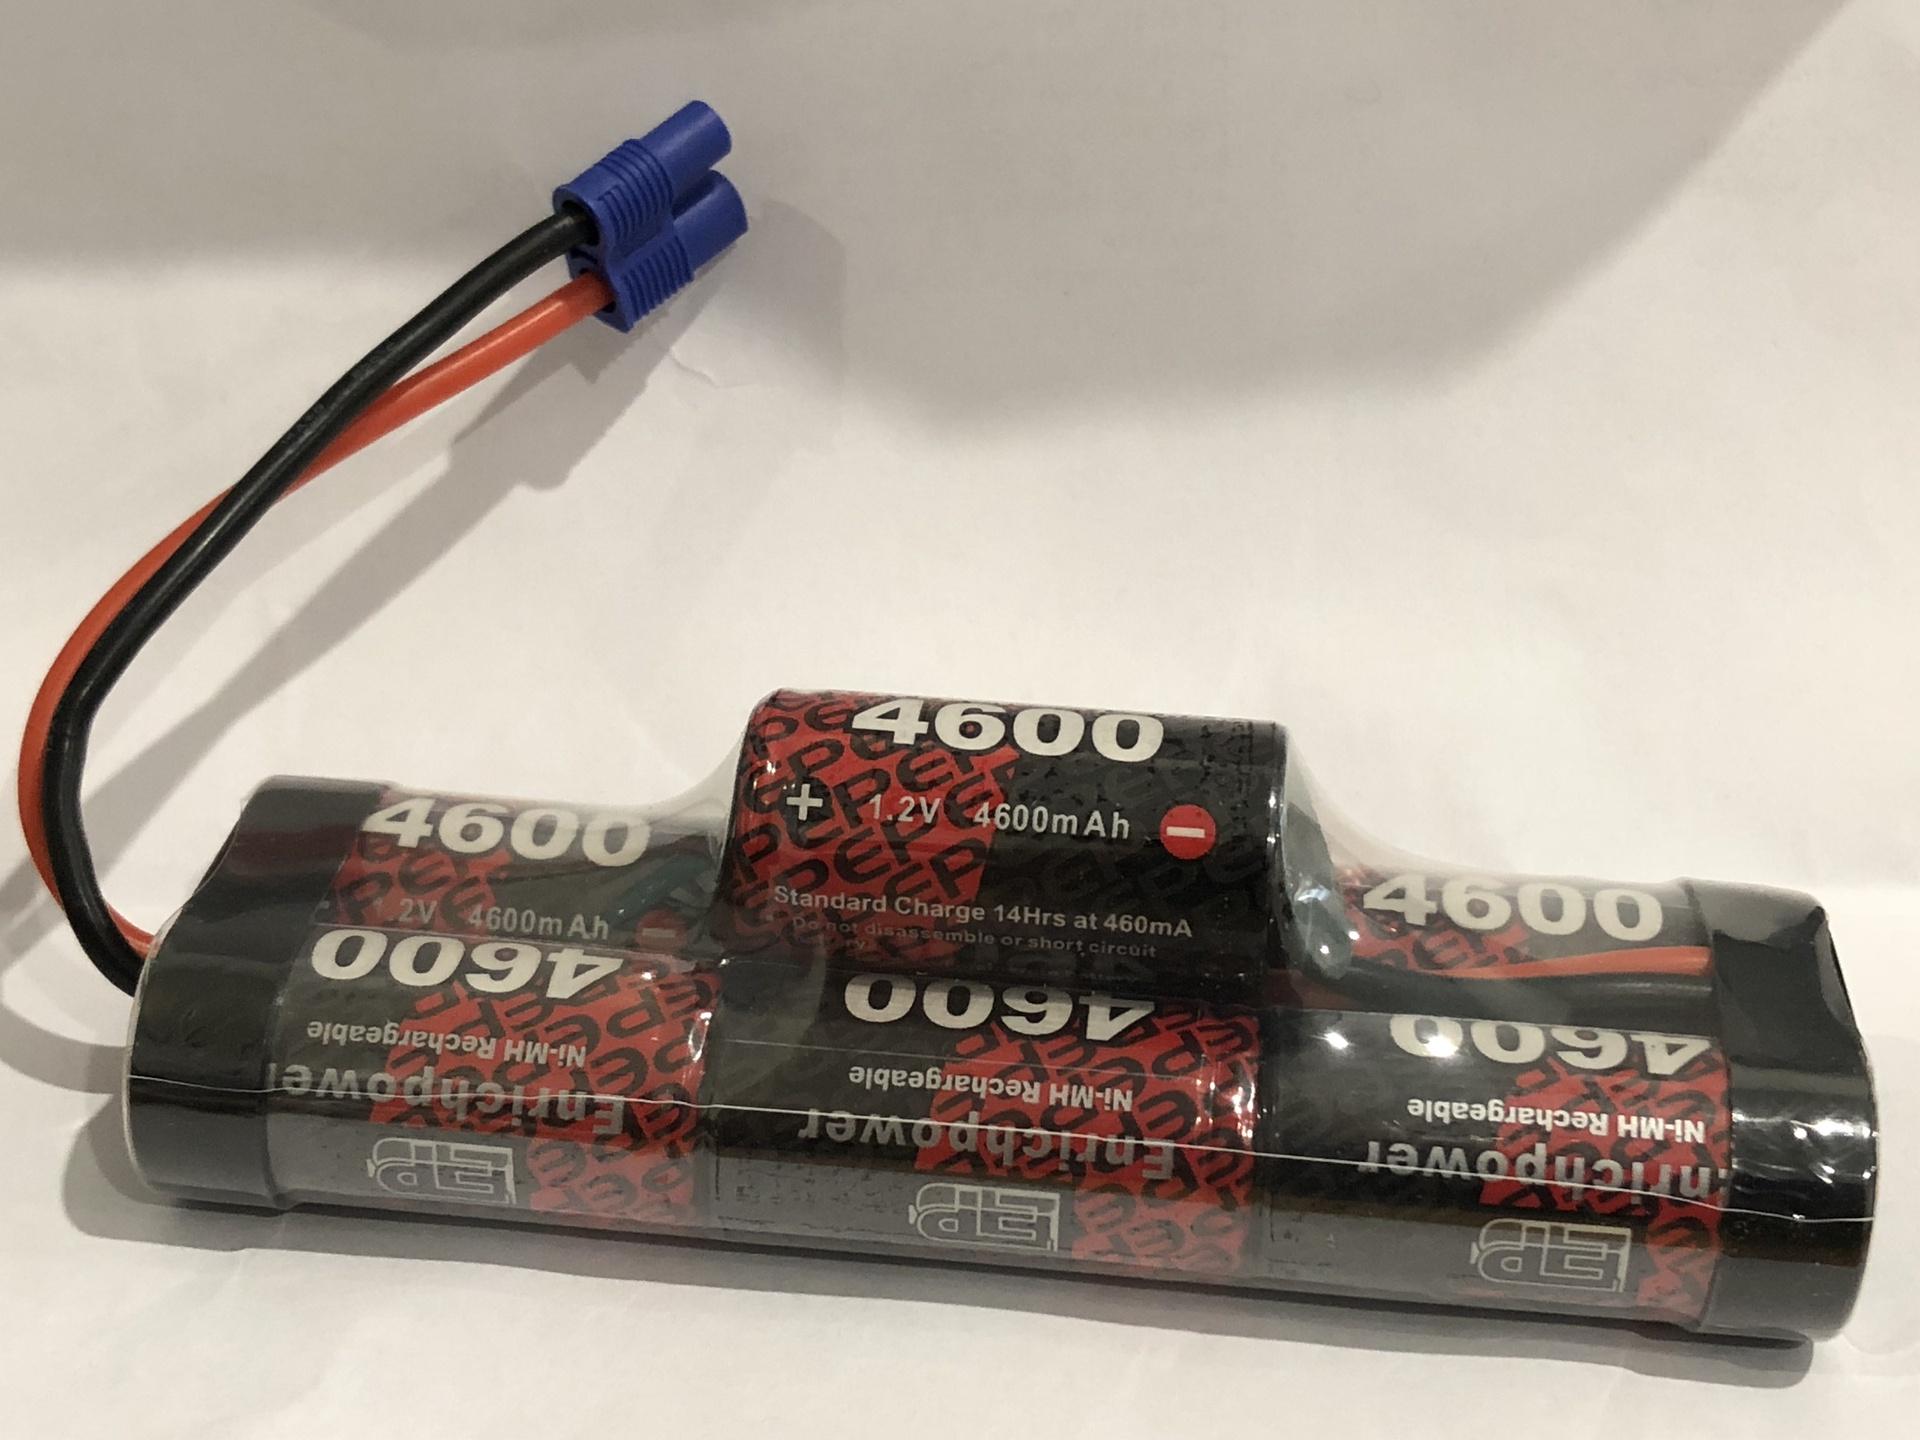 Enrichpower #EP4600-7BH-EC3 8.4V Hump Pack with EC3 (ARRMA )